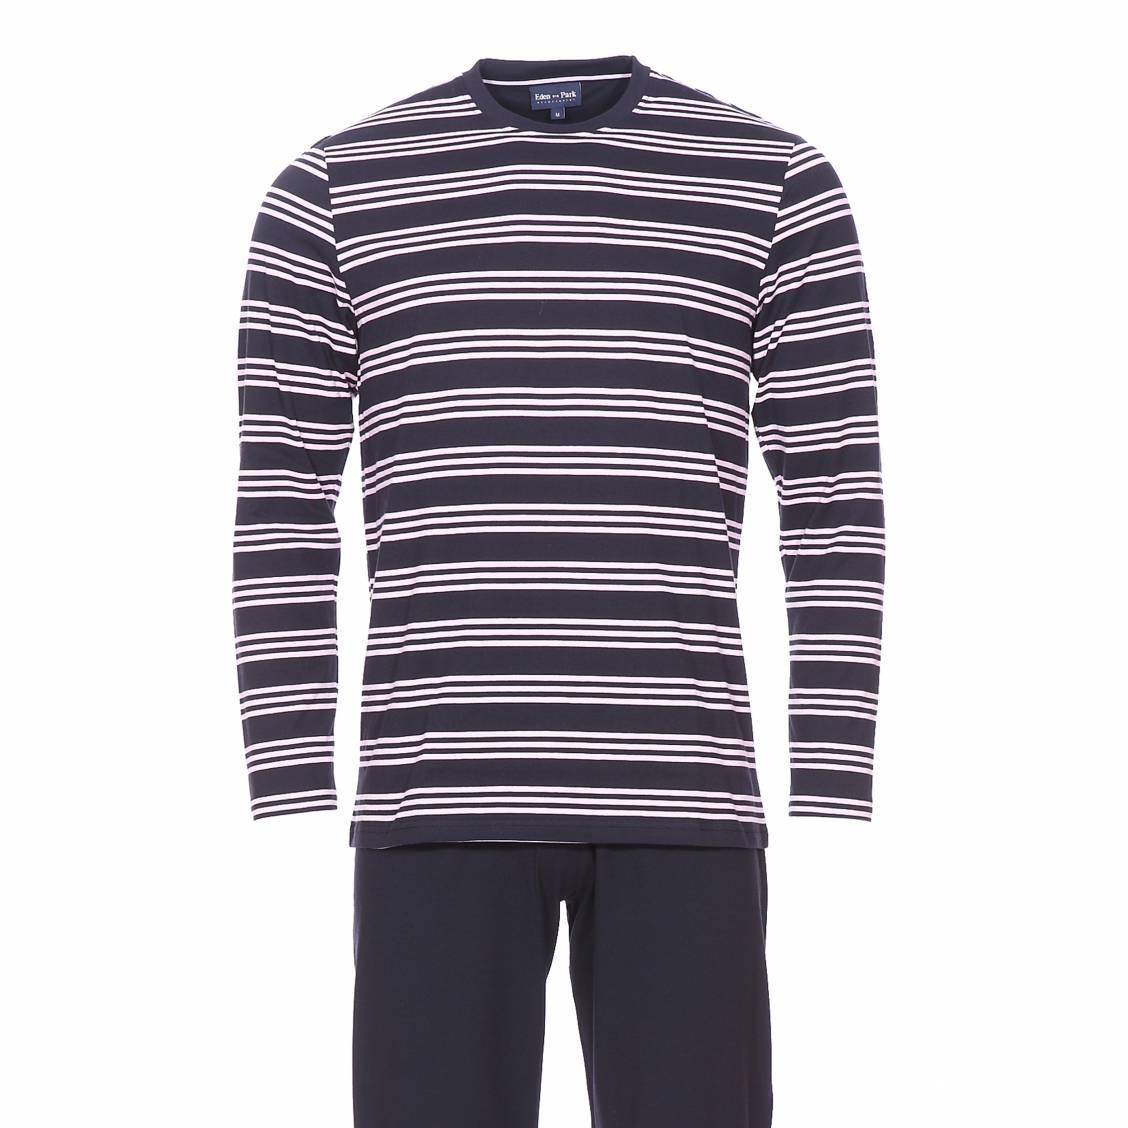 Pyjama long  en coton : tee-shirt manches longues bleu marine à rayures rose pâle et pantalon uni bleu marine